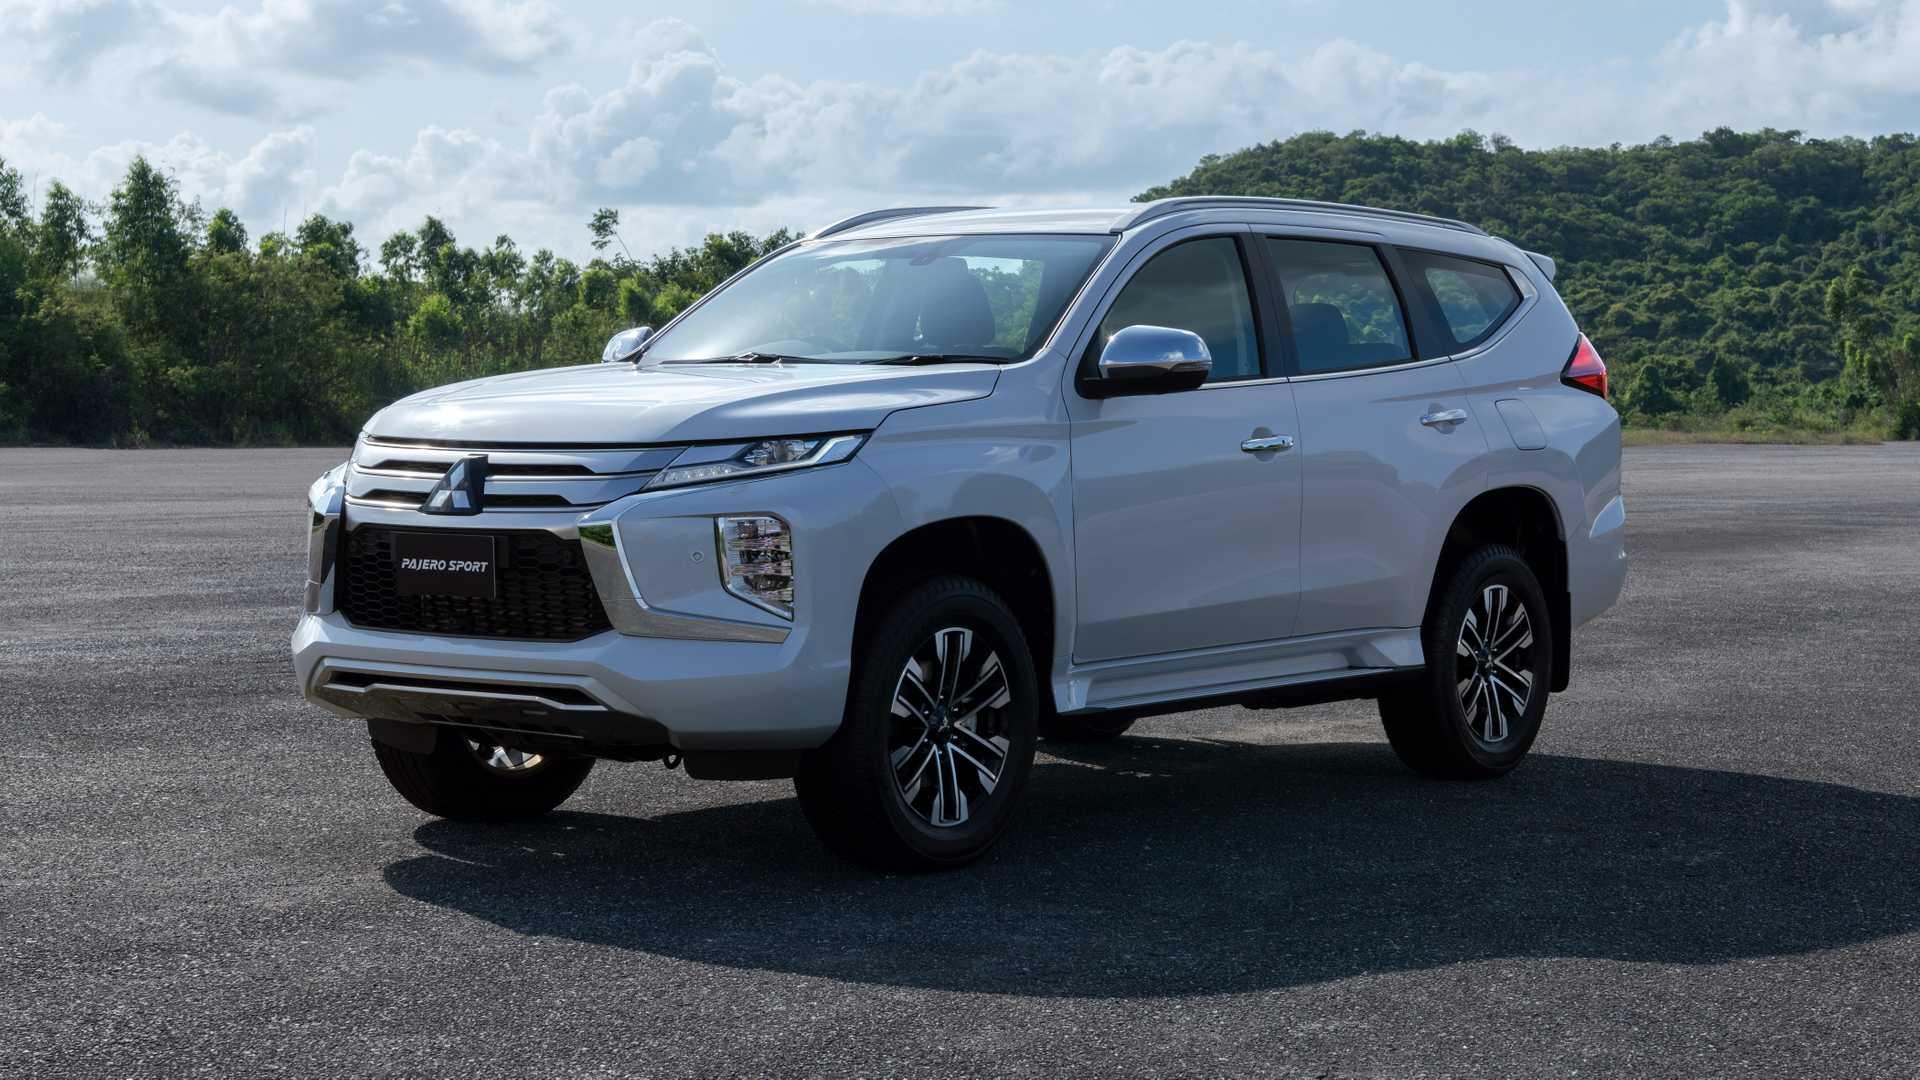 2020_Mitsubishi_Pajero_Sport_facelift_0006